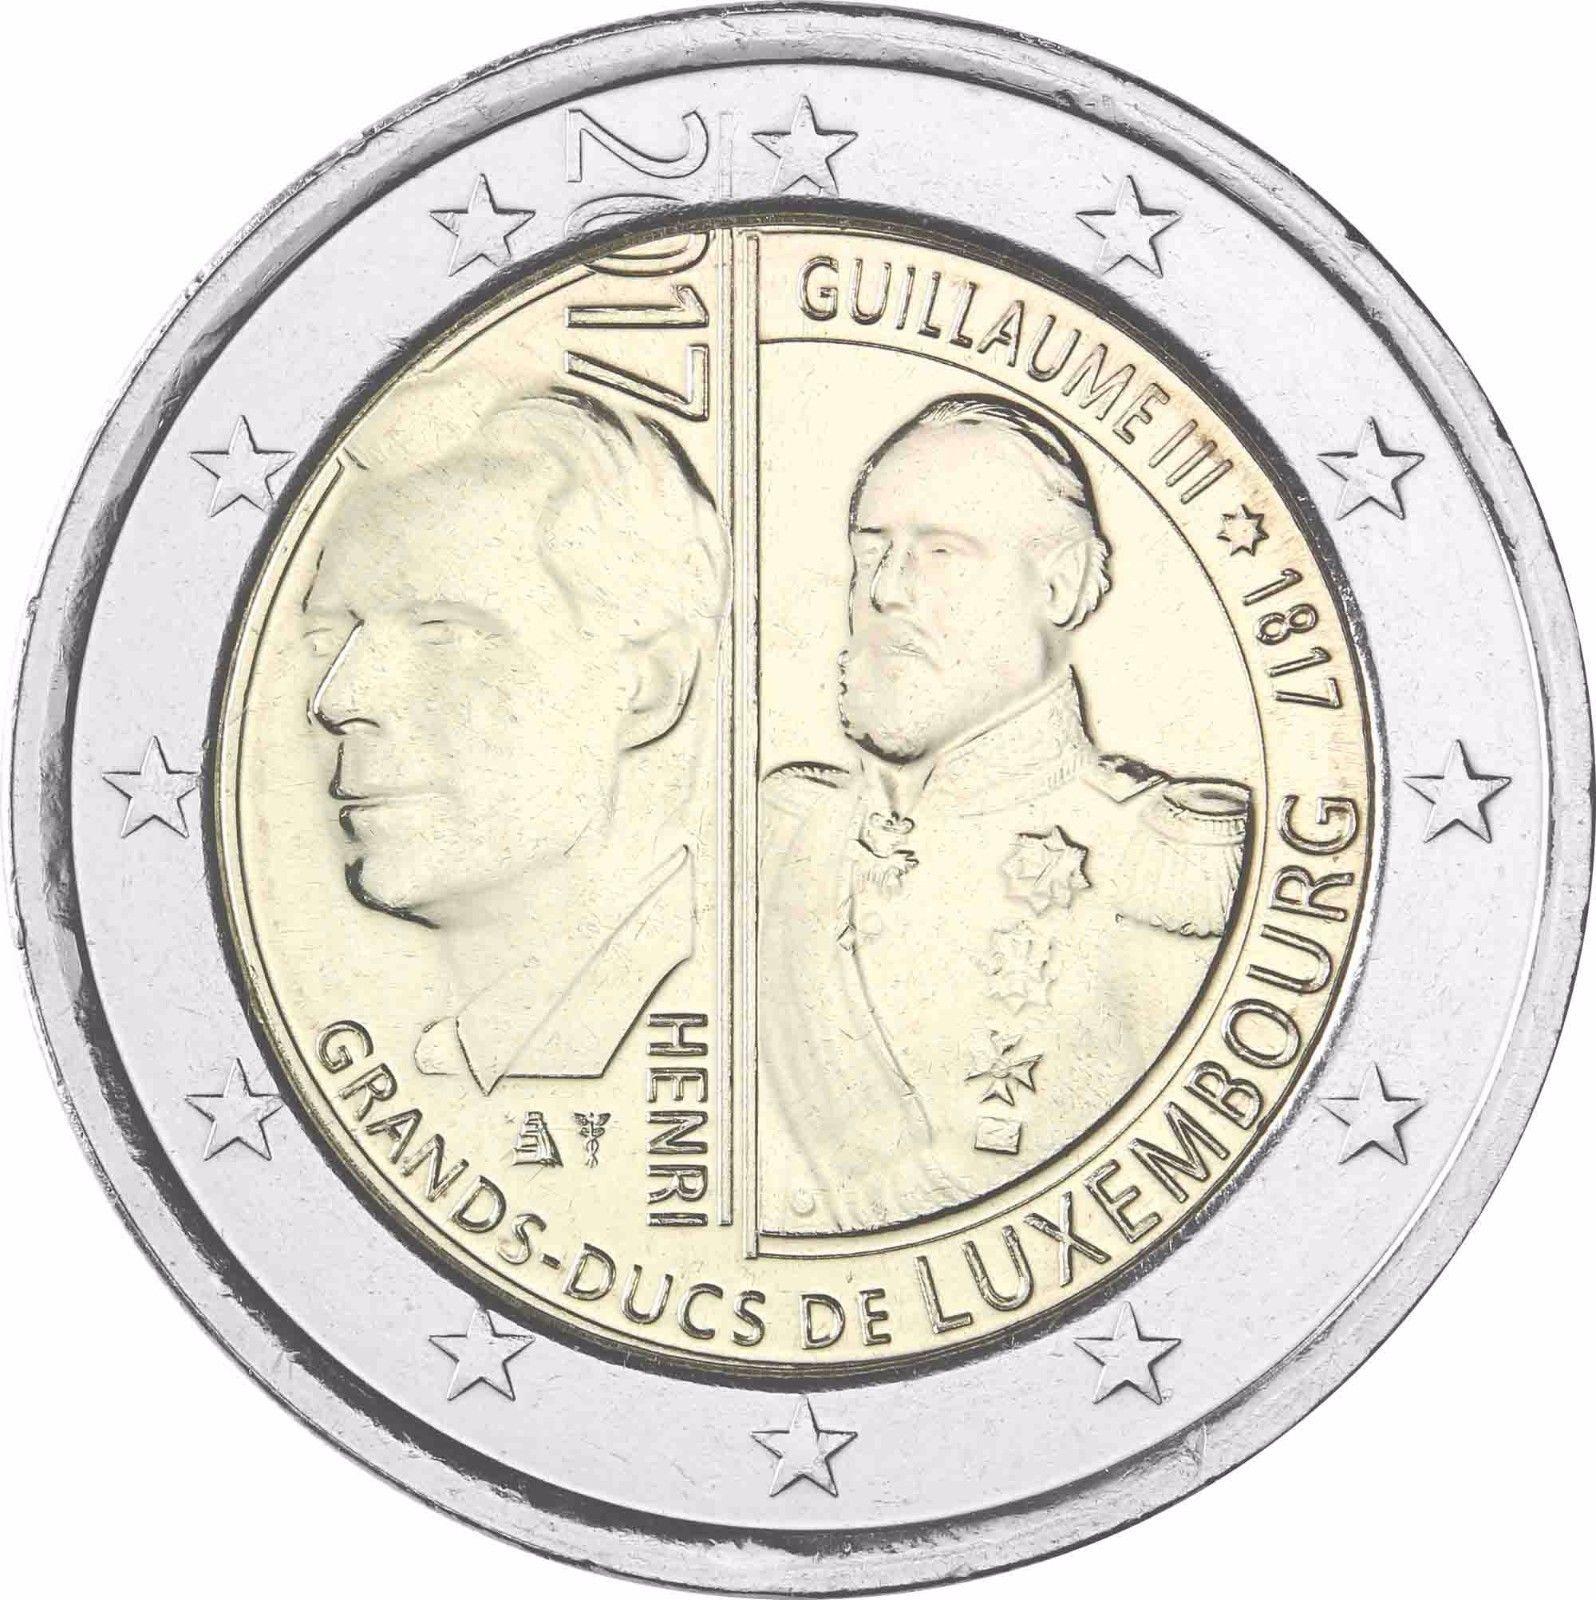 Люксембург 2 евро 2017 г. 200 лет со дня рождения Великого герцога Виллема III